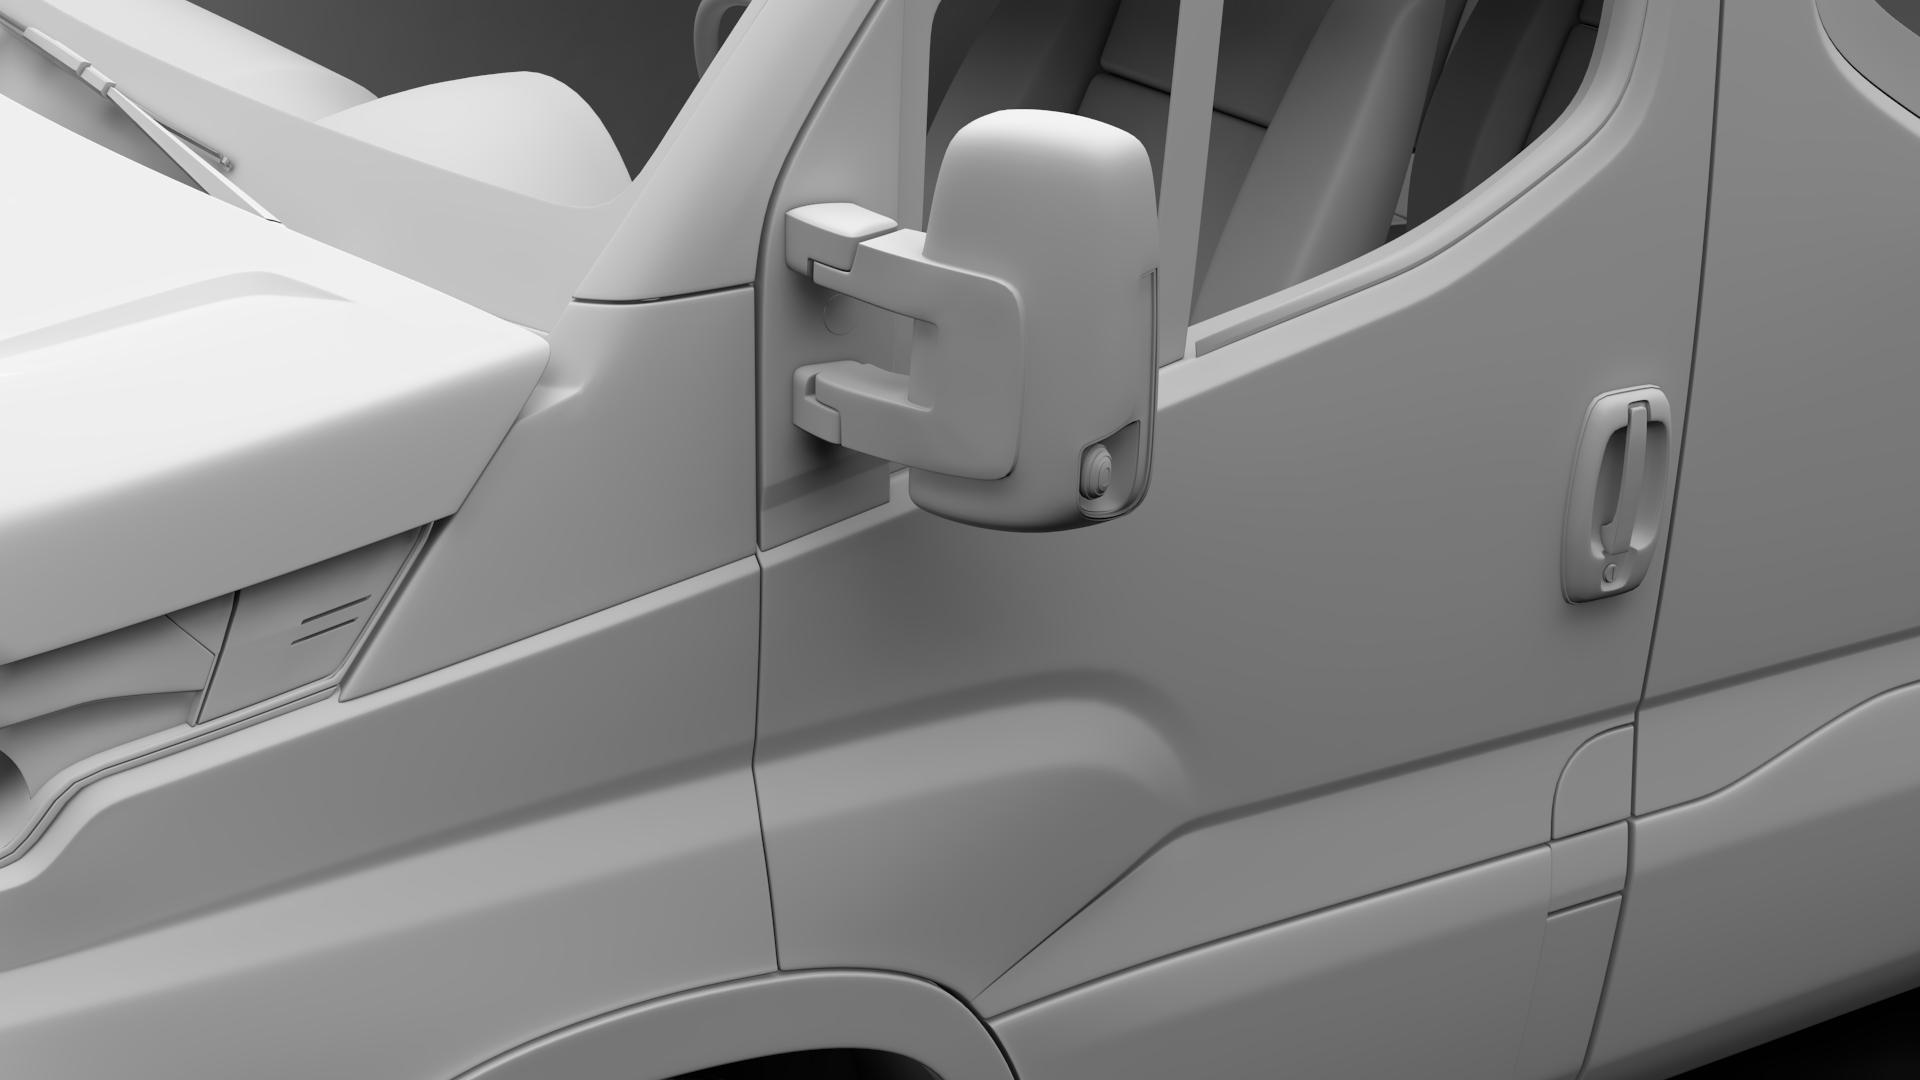 iveco daily minibus l2h2 2017 3d model max fbx c4d lwo ma mb hrc xsi obj 276021